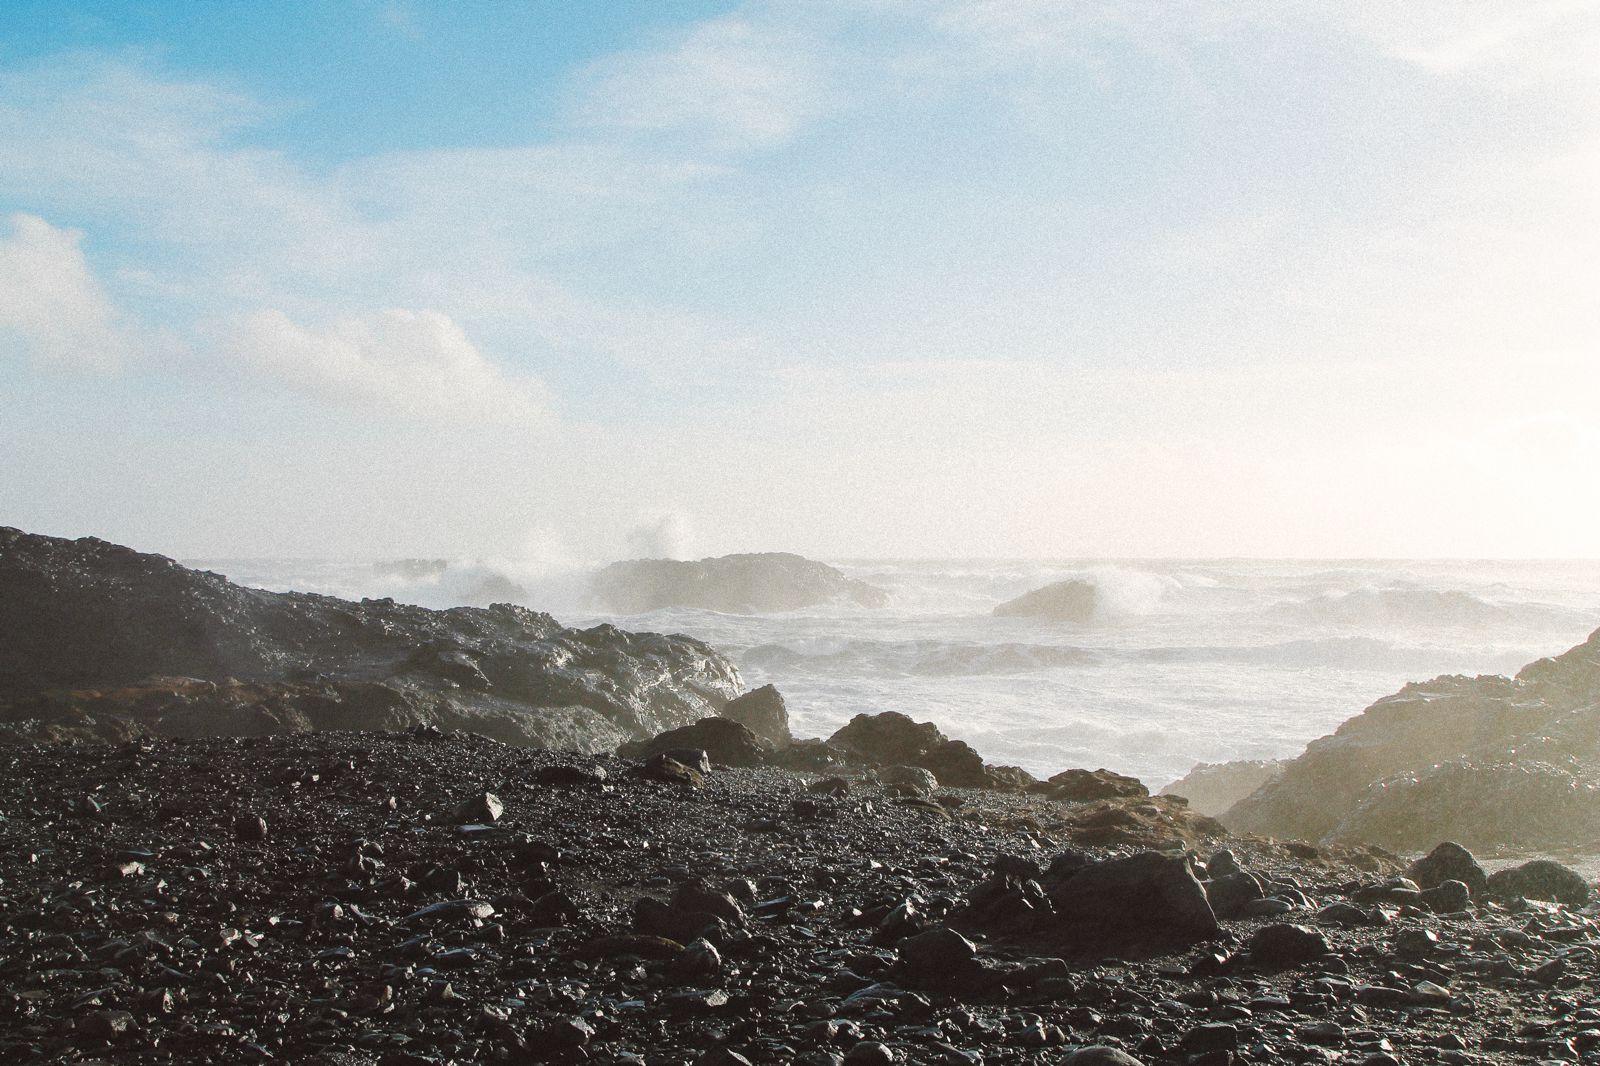 Dyrhólaey, Iceland - A Photo Diary... (7)